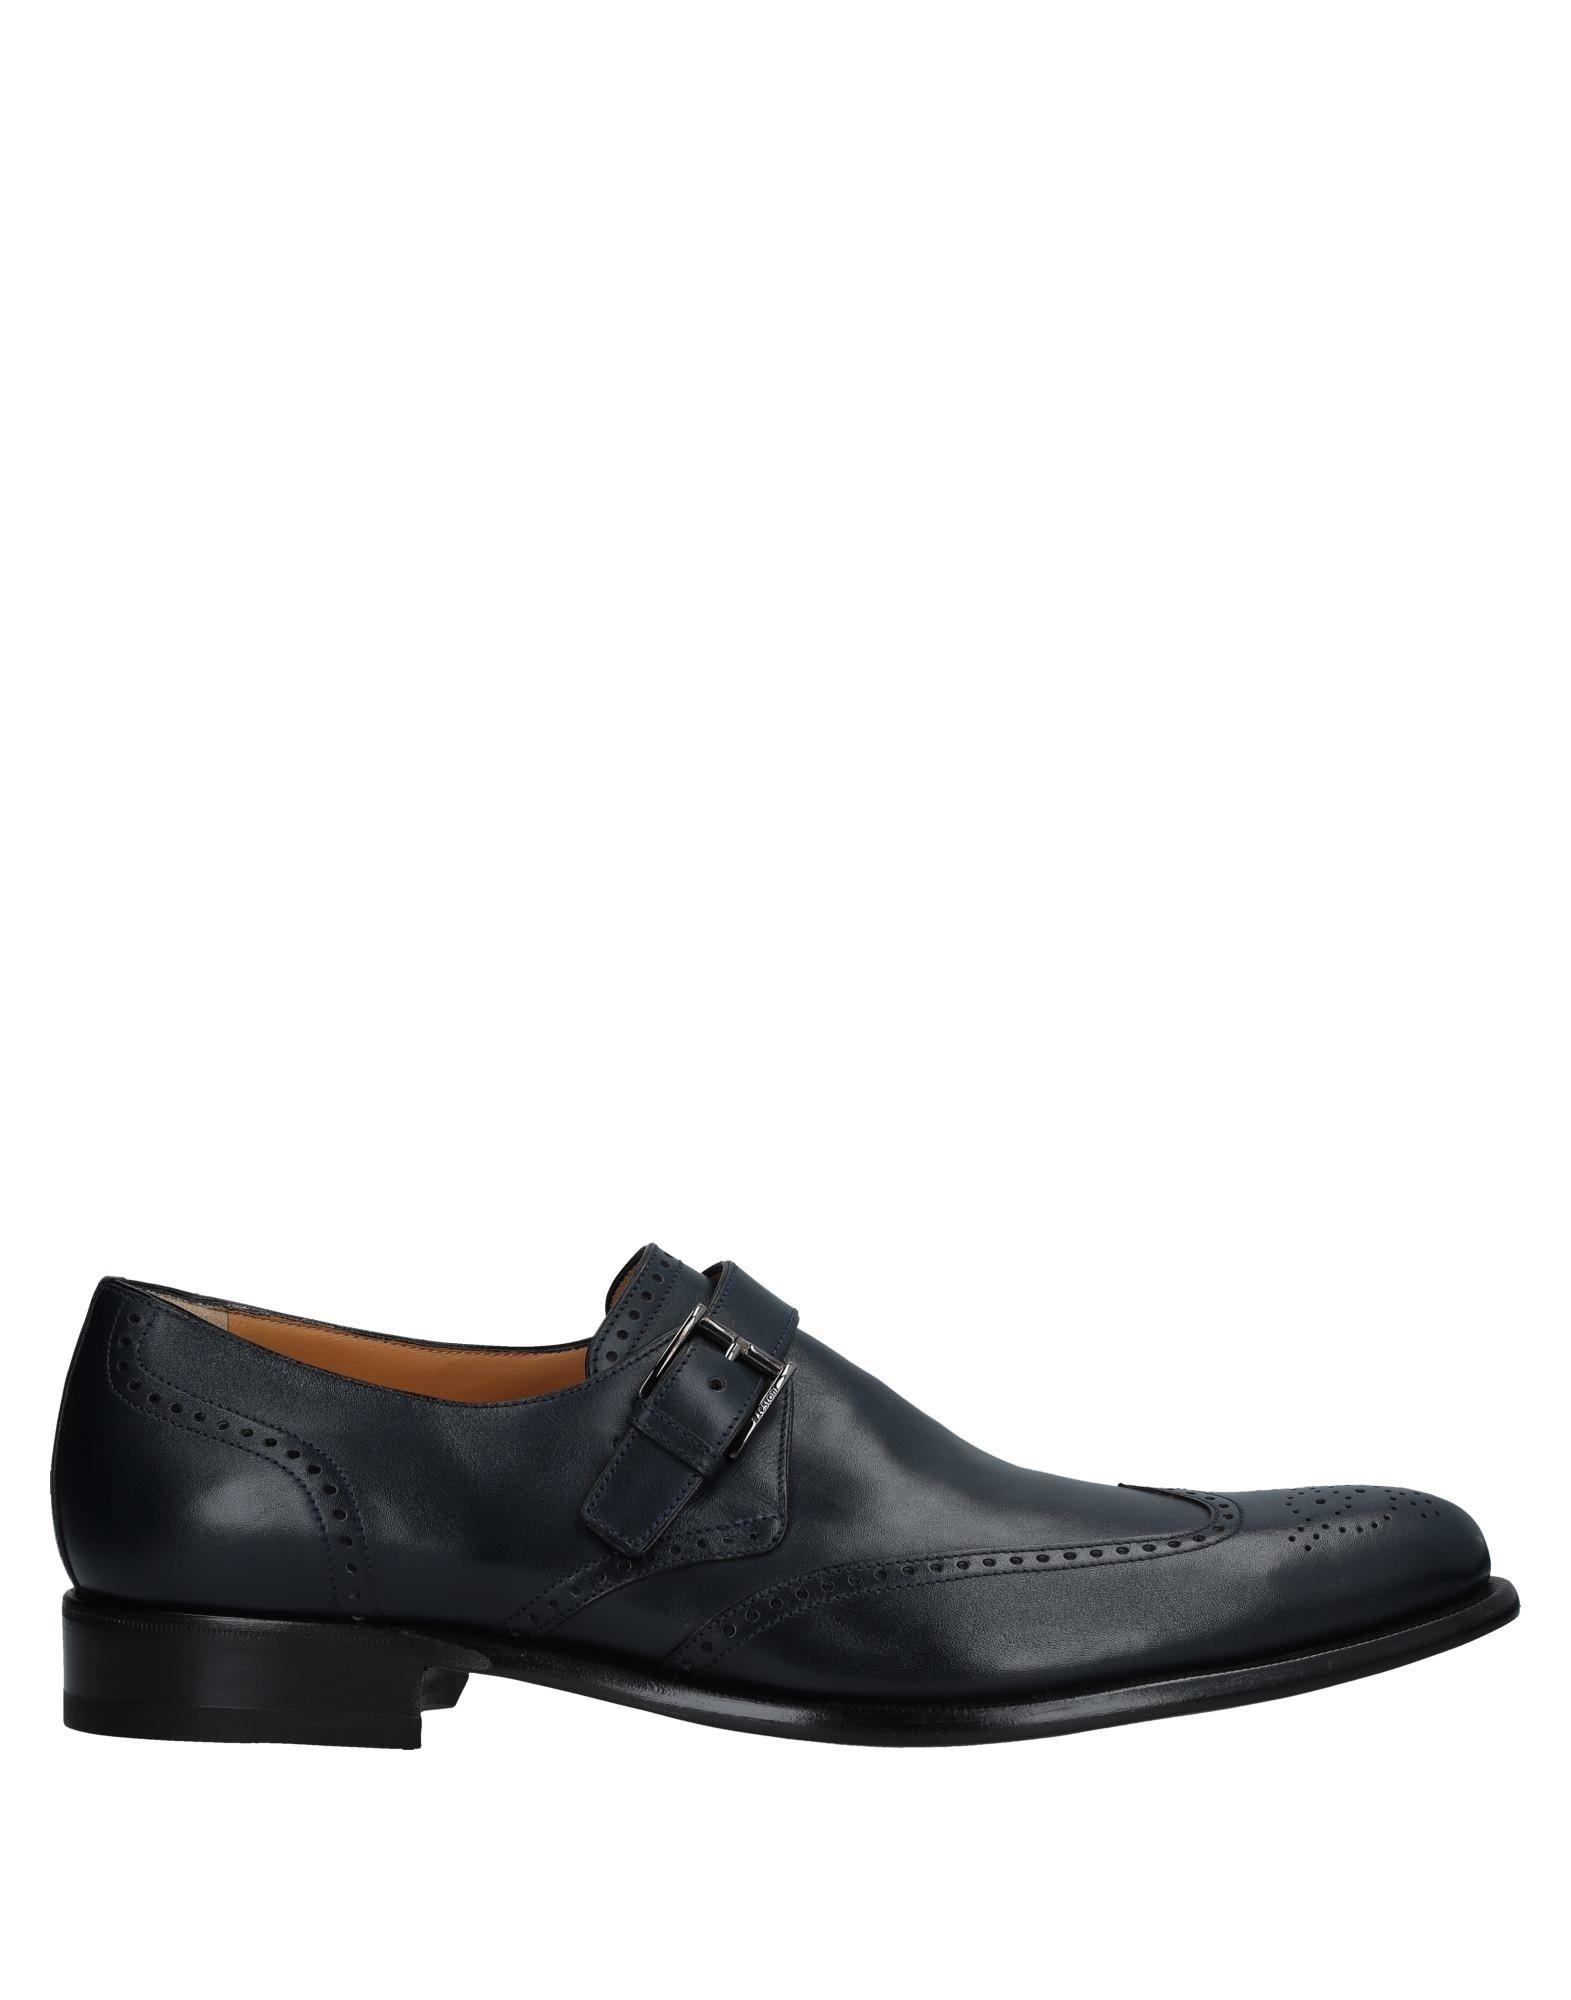 A.Testoni Mokassins Herren  11540310SX Gute Qualität beliebte Schuhe